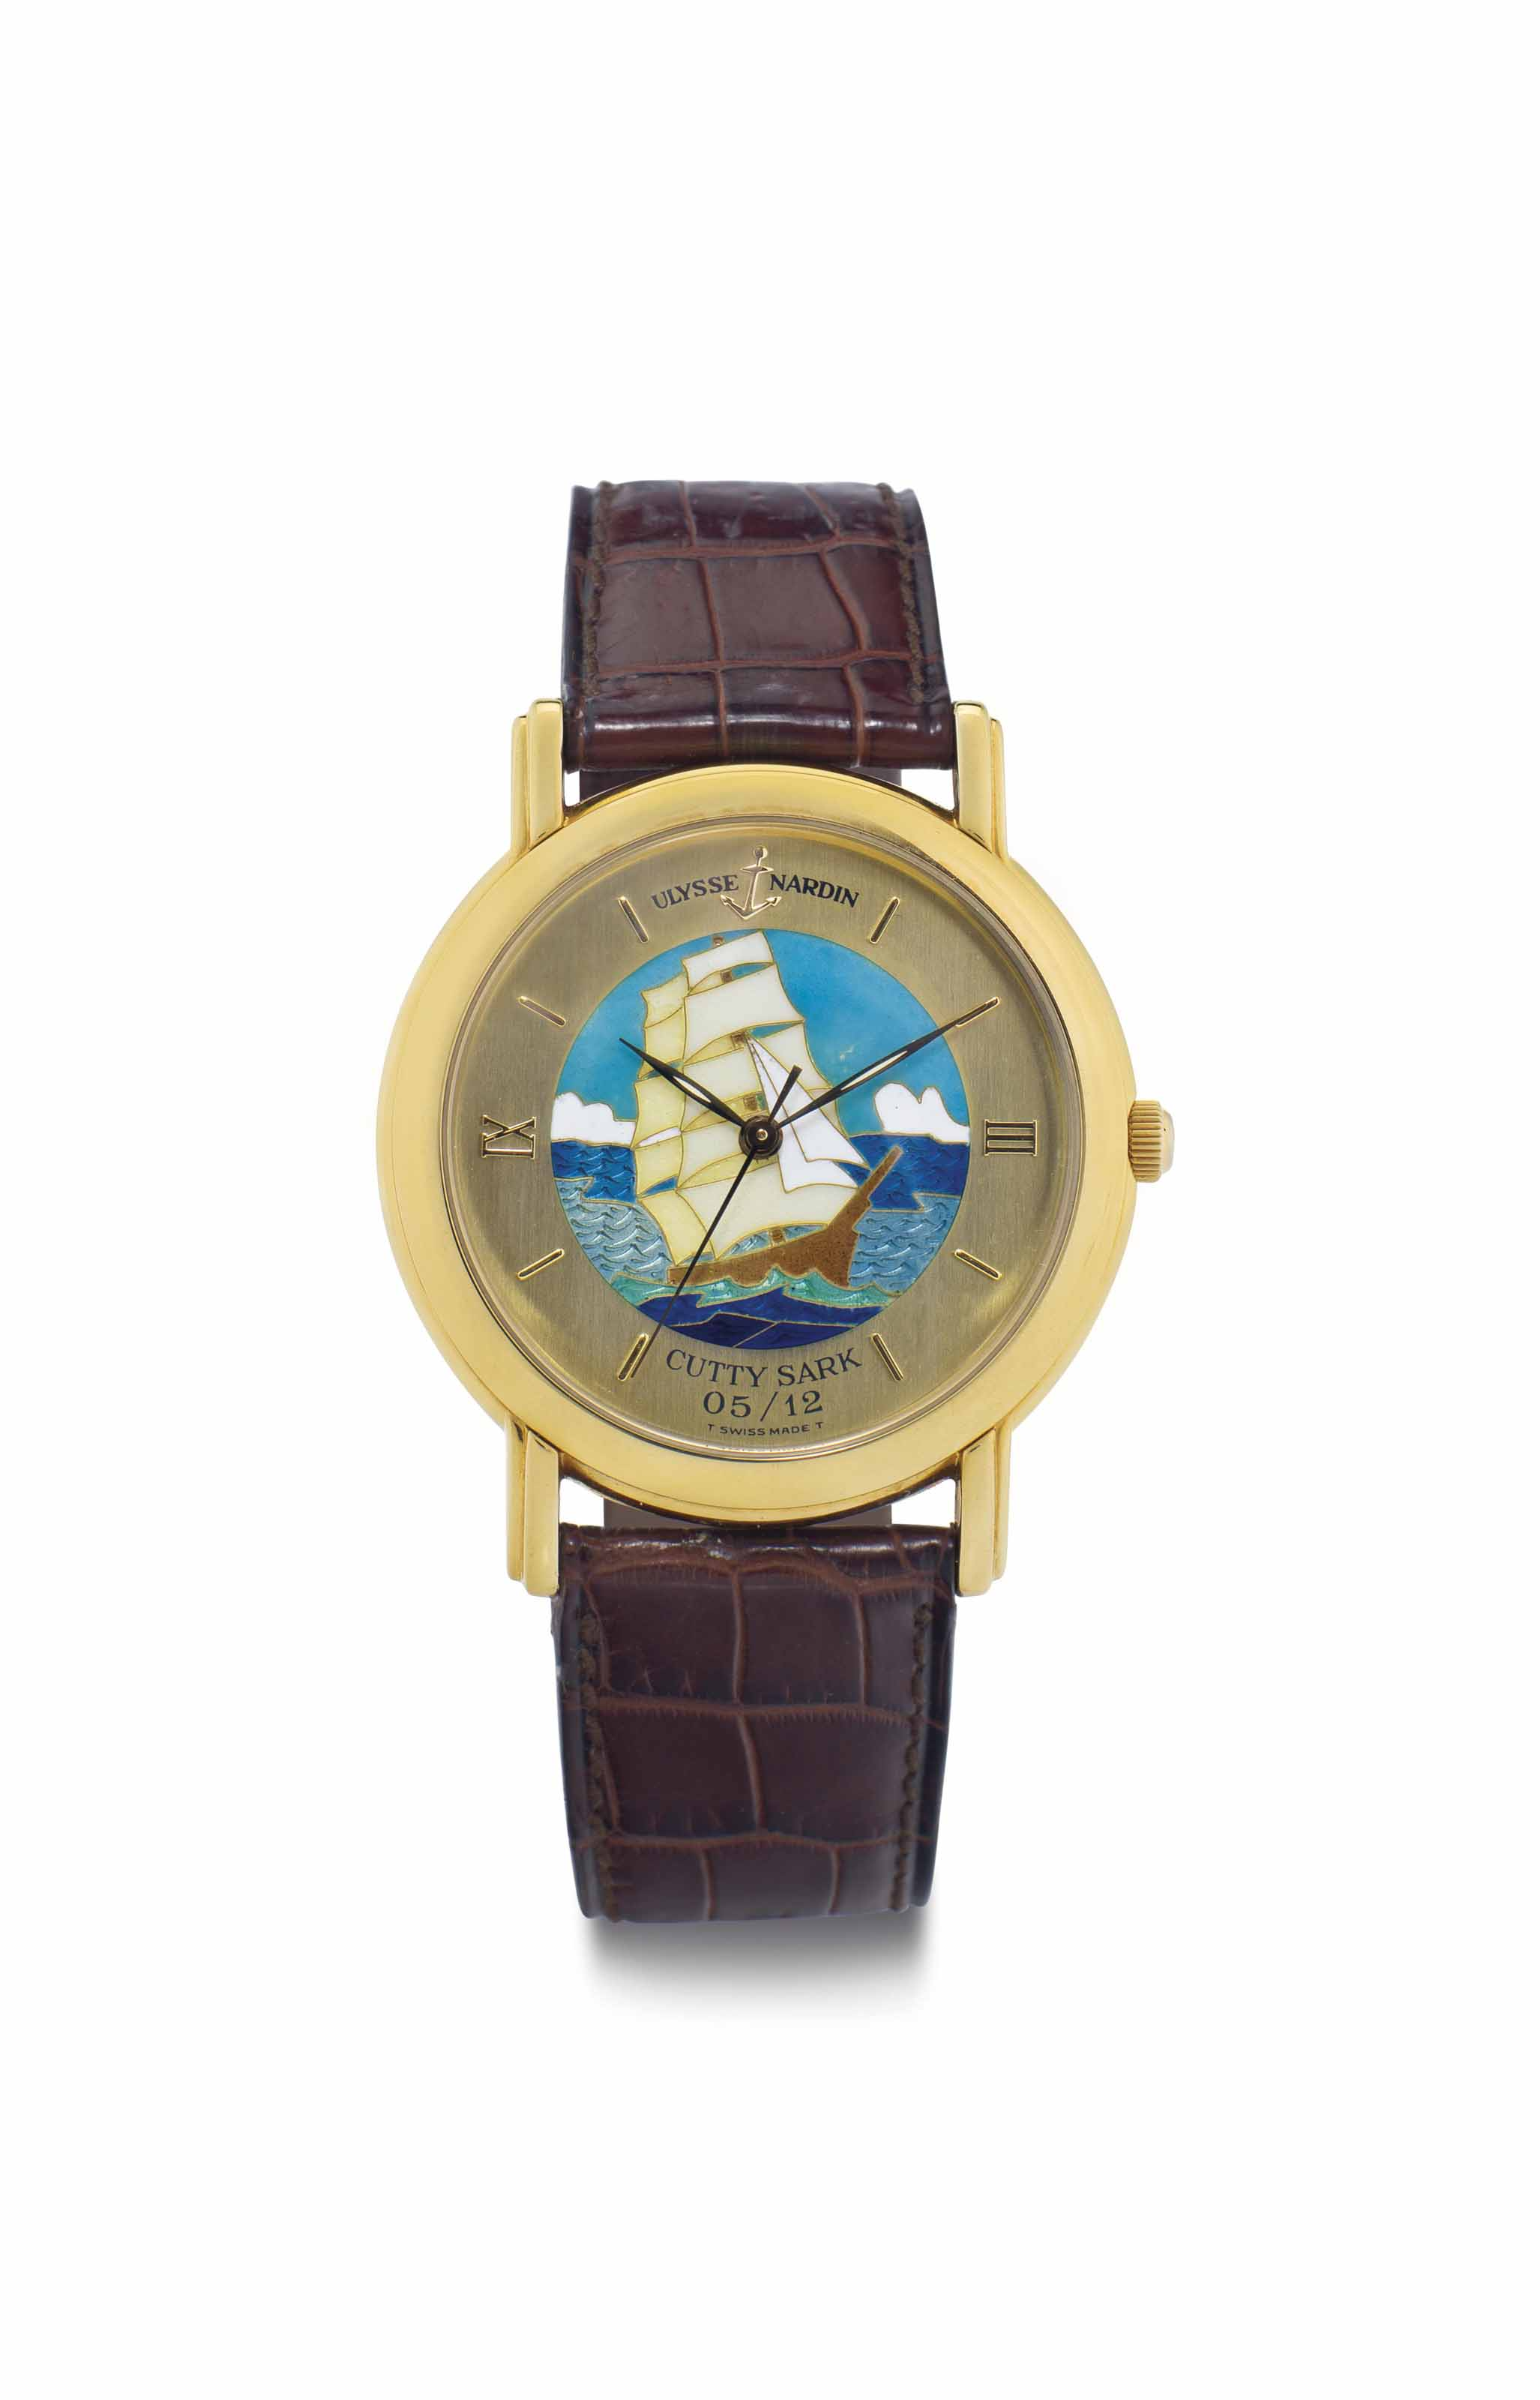 Ulysse Nardin. A Fine Limited Edition 18k Gold Automatic Wristwatch with Cloisonné Enamel Dial